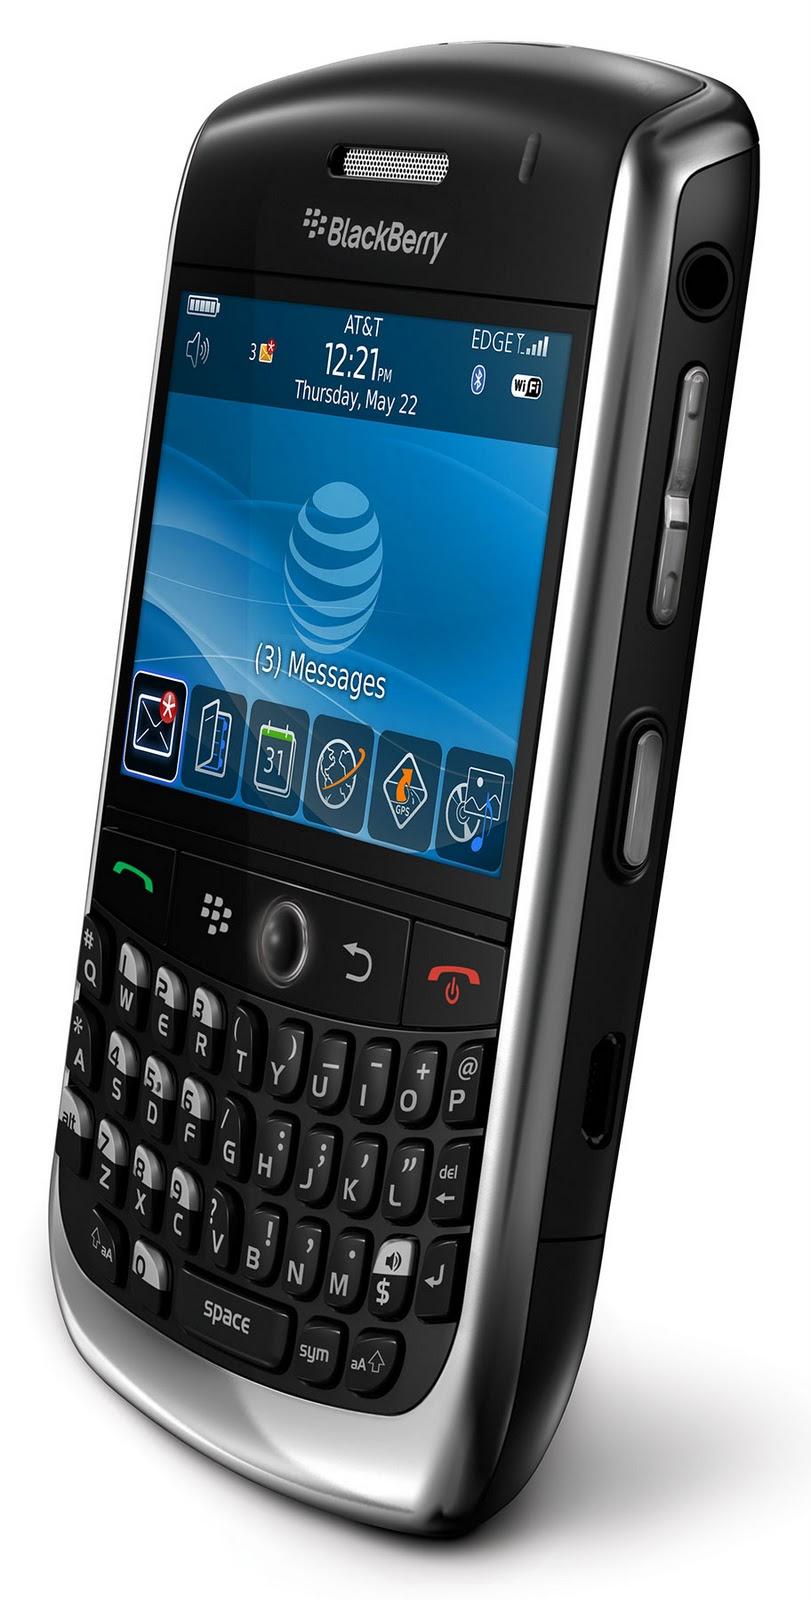 Blackberry theme gucci - ErickEverett's blog